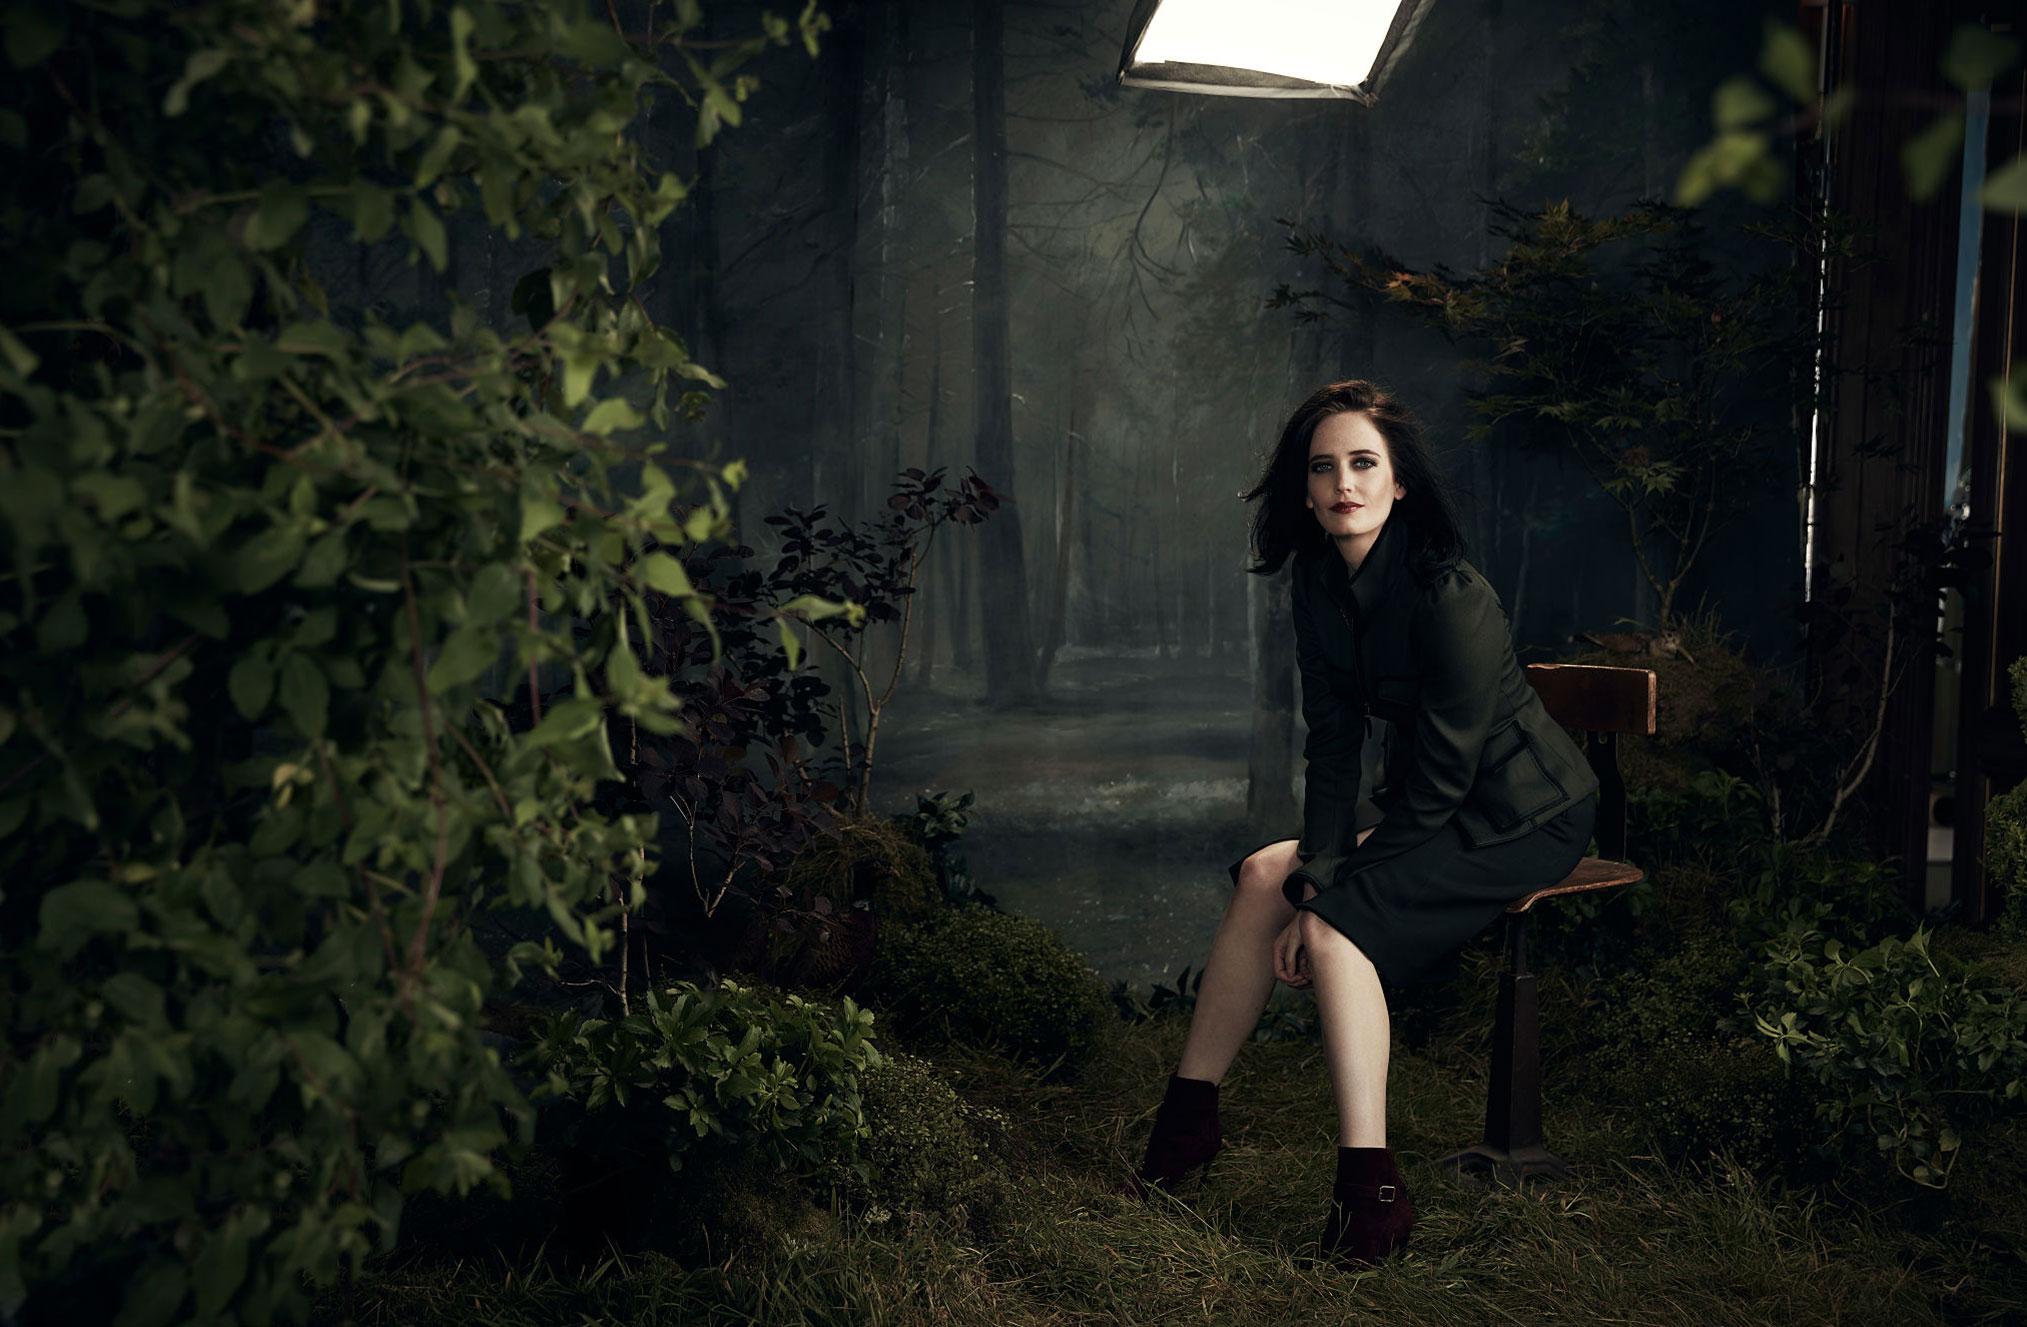 промосъемка Евы Грин для киностудии 20th Century Fox / фото 15